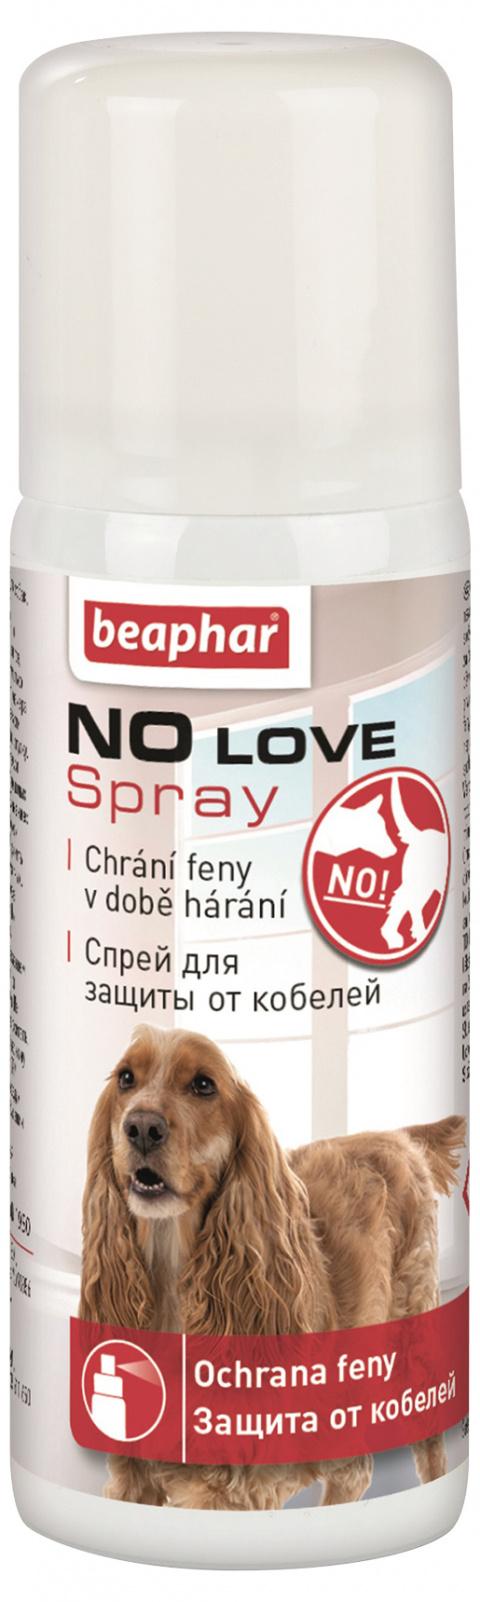 Аэрозоль для самок во время течки - Beaphar No Love Spray for Dogs, 50 мл  title=